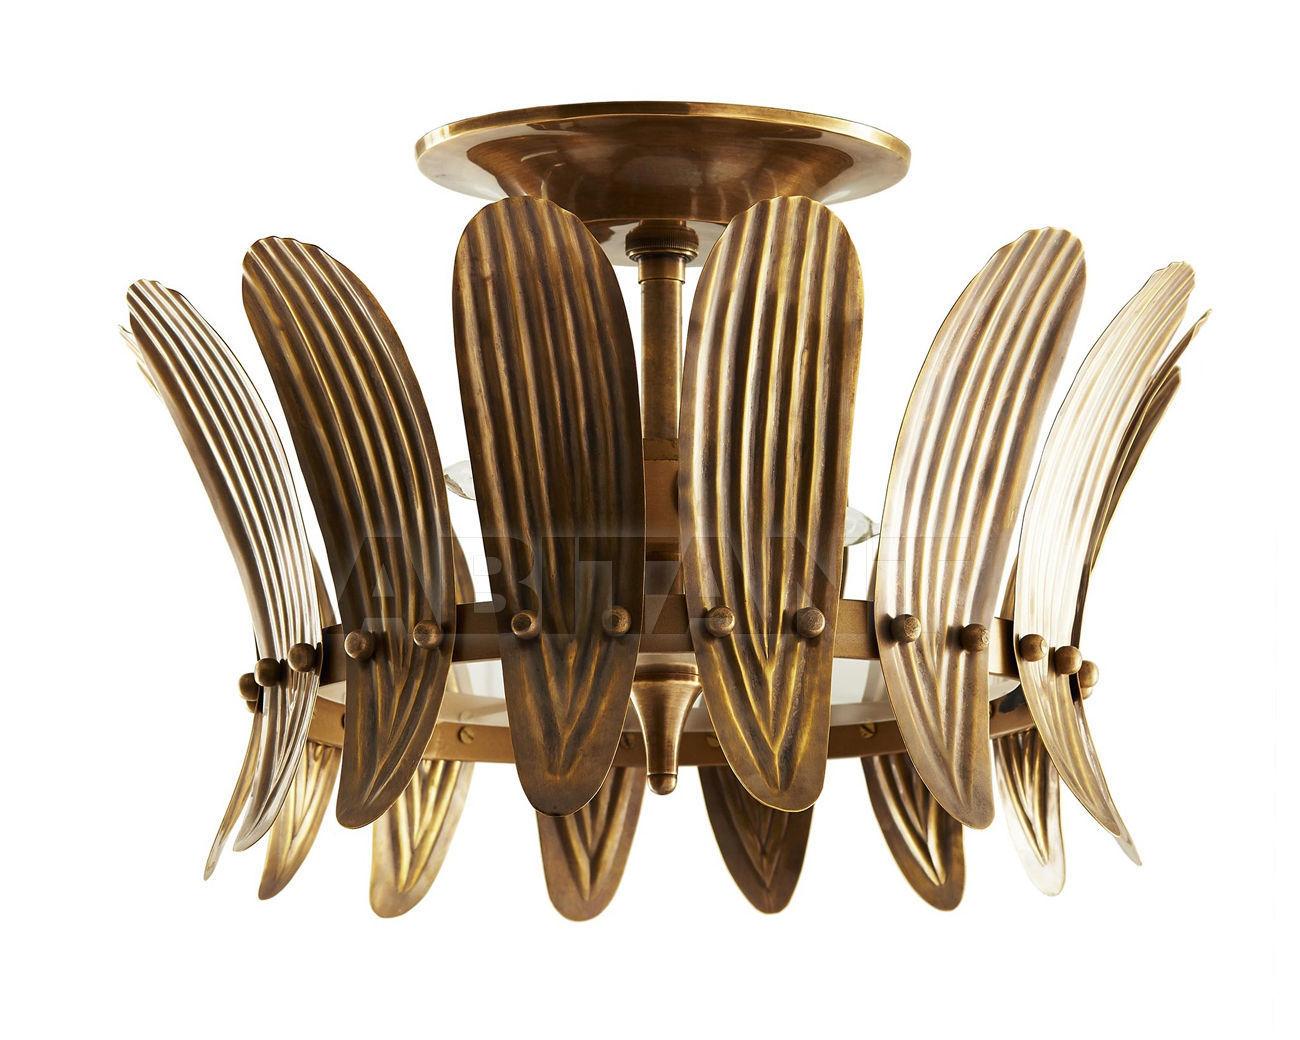 Купить Светильник Analise  Arteriors Home  LIGHTING 42252